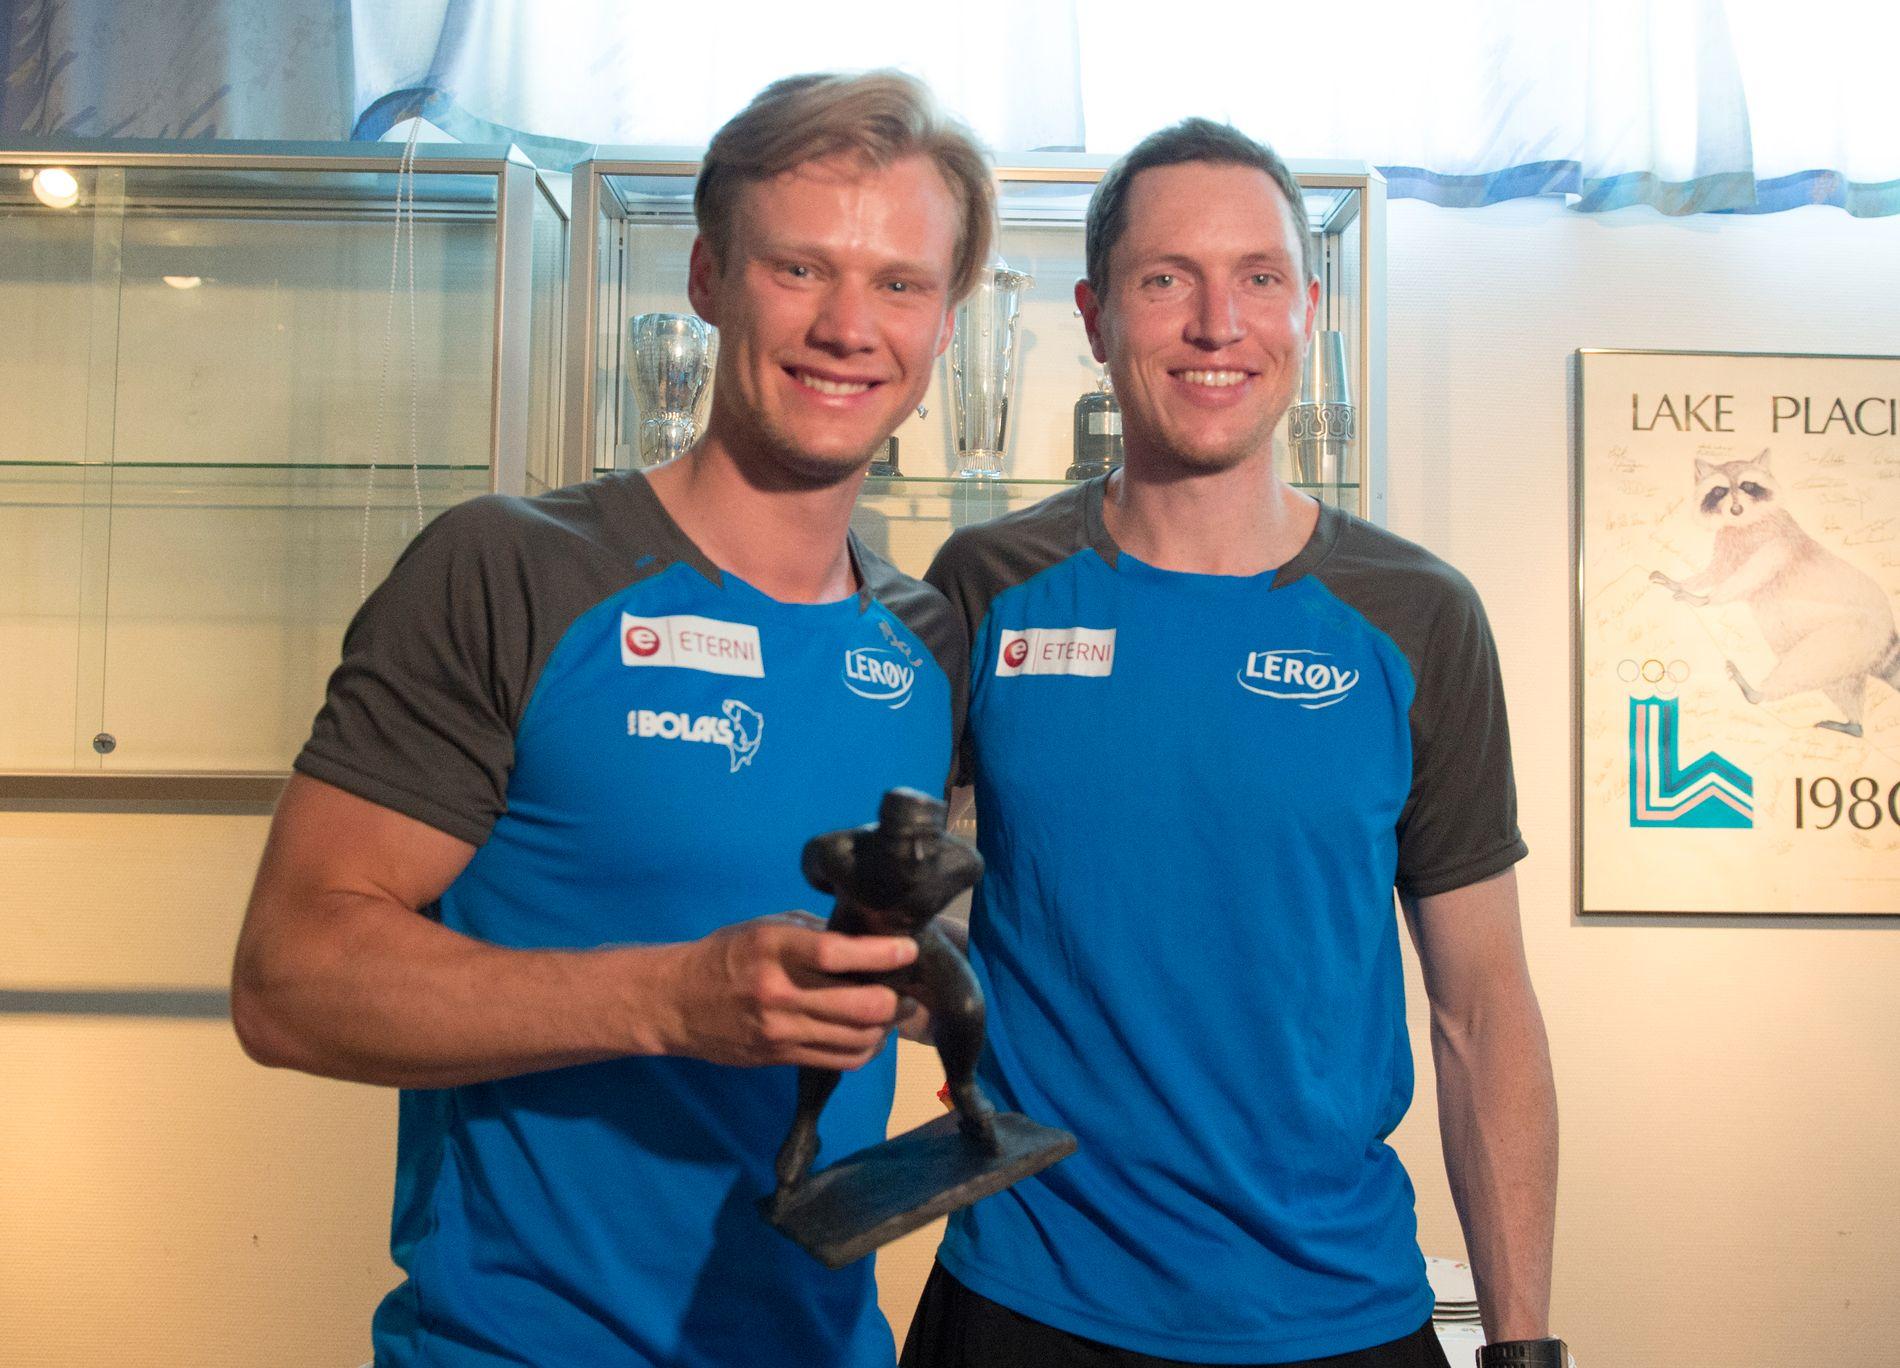 HEDRET: Håvard Holmefjord Lorentzen (t.v.), her sammen med treneren Jeremy Wotherspoon som tidligere har vunnet Oscarstatuetten.